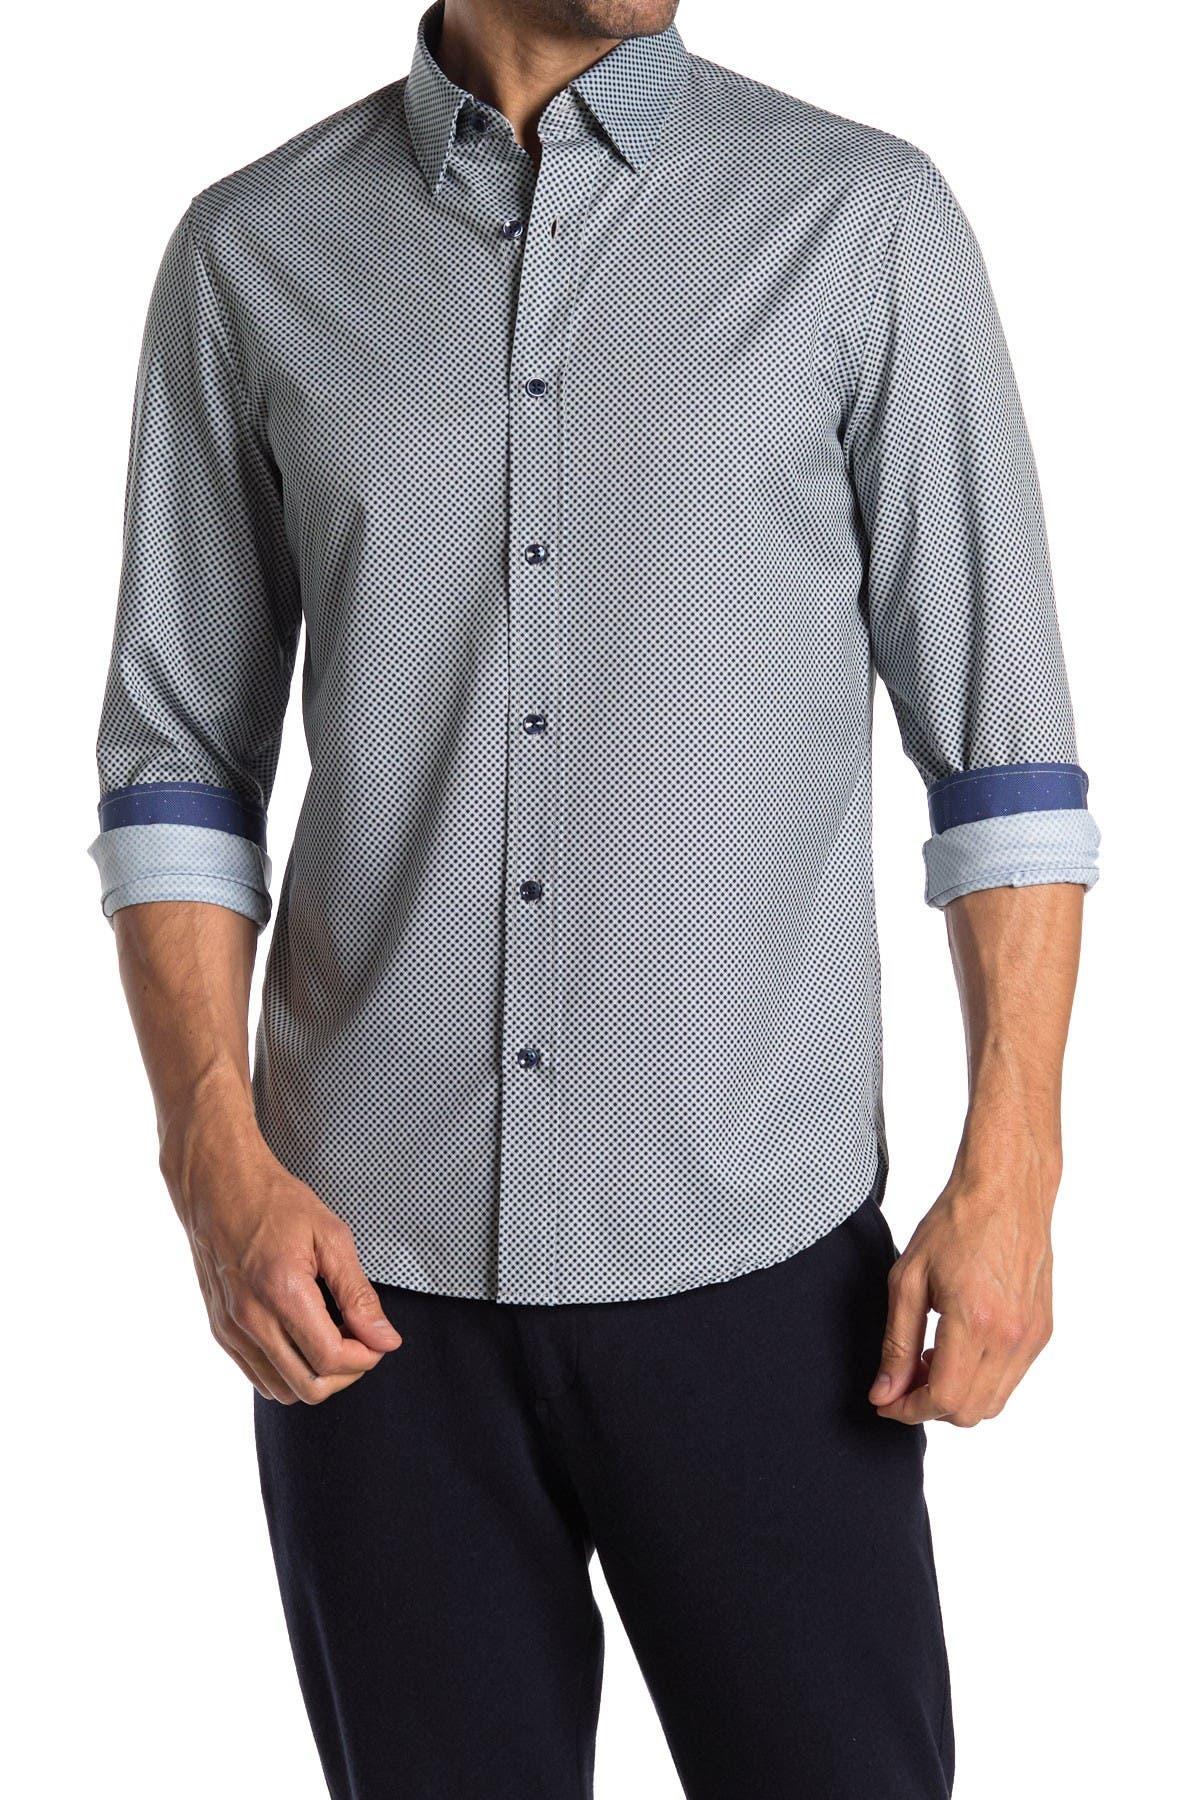 Image of BROOKLYN BRIGADE Mini Gingham Print Performance Shirt